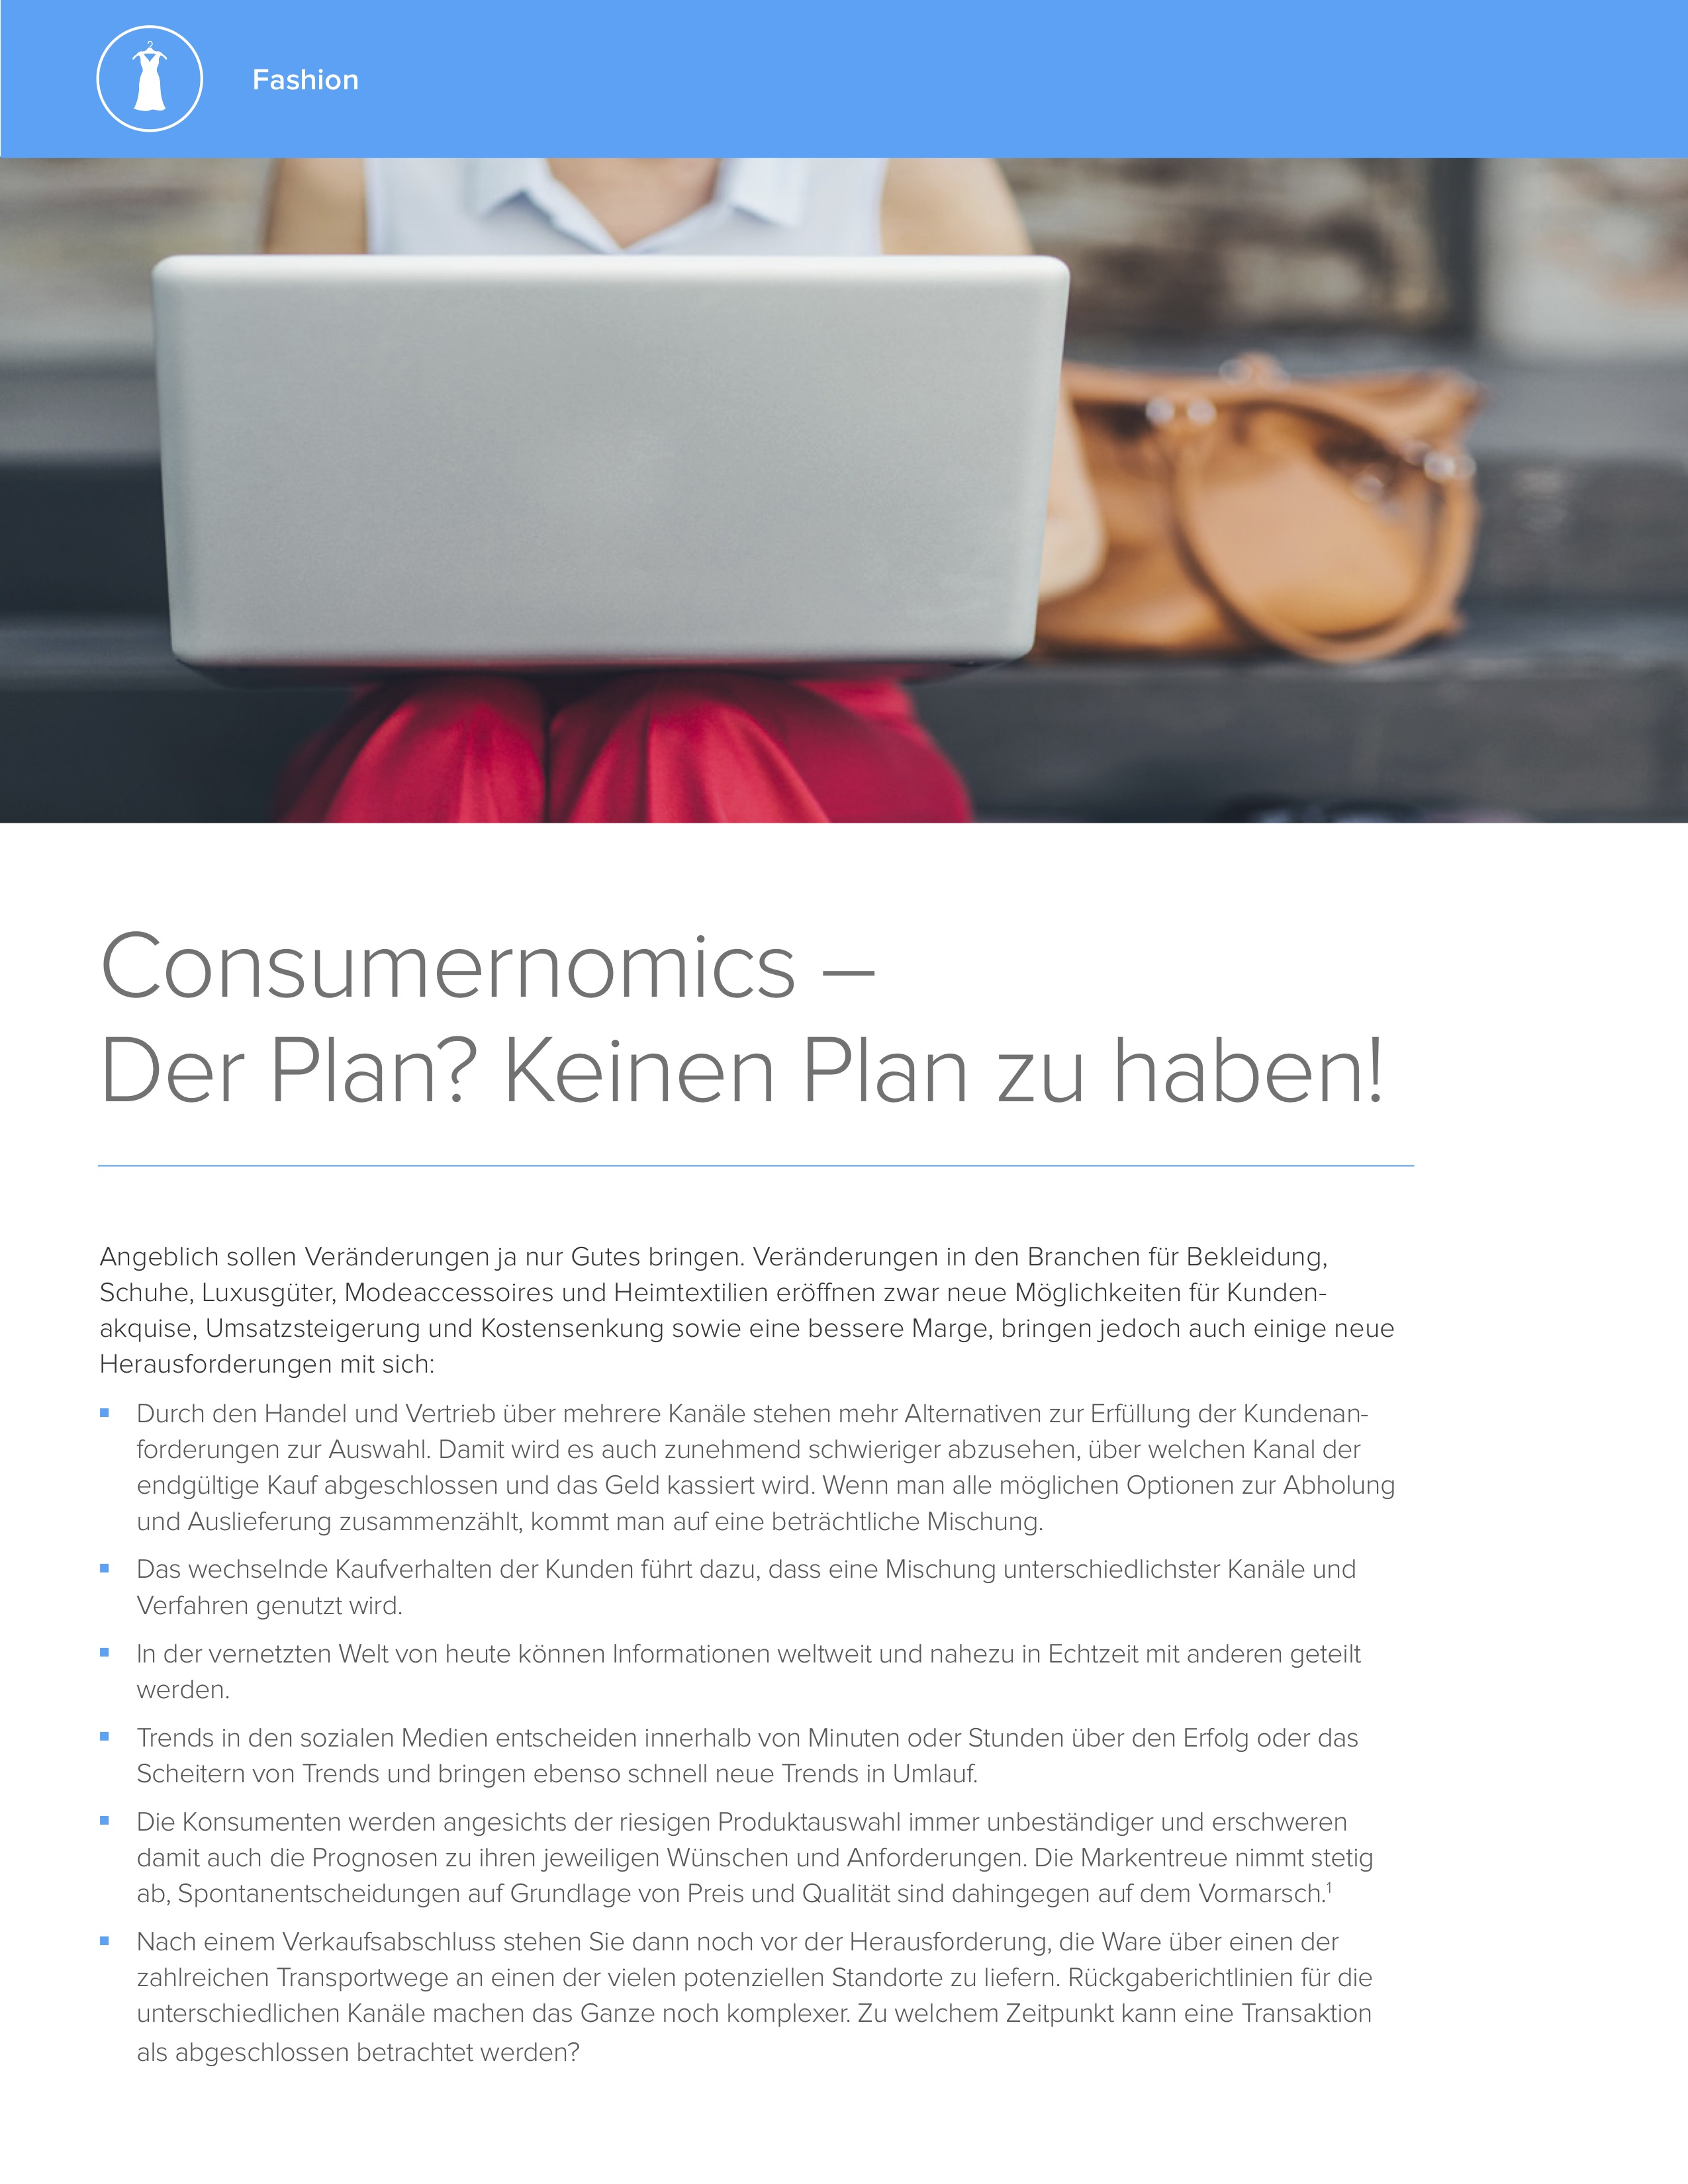 Square cropped fashion consumernomics  der  plan keinen plan zu habencover d31739e5c4b4dd71